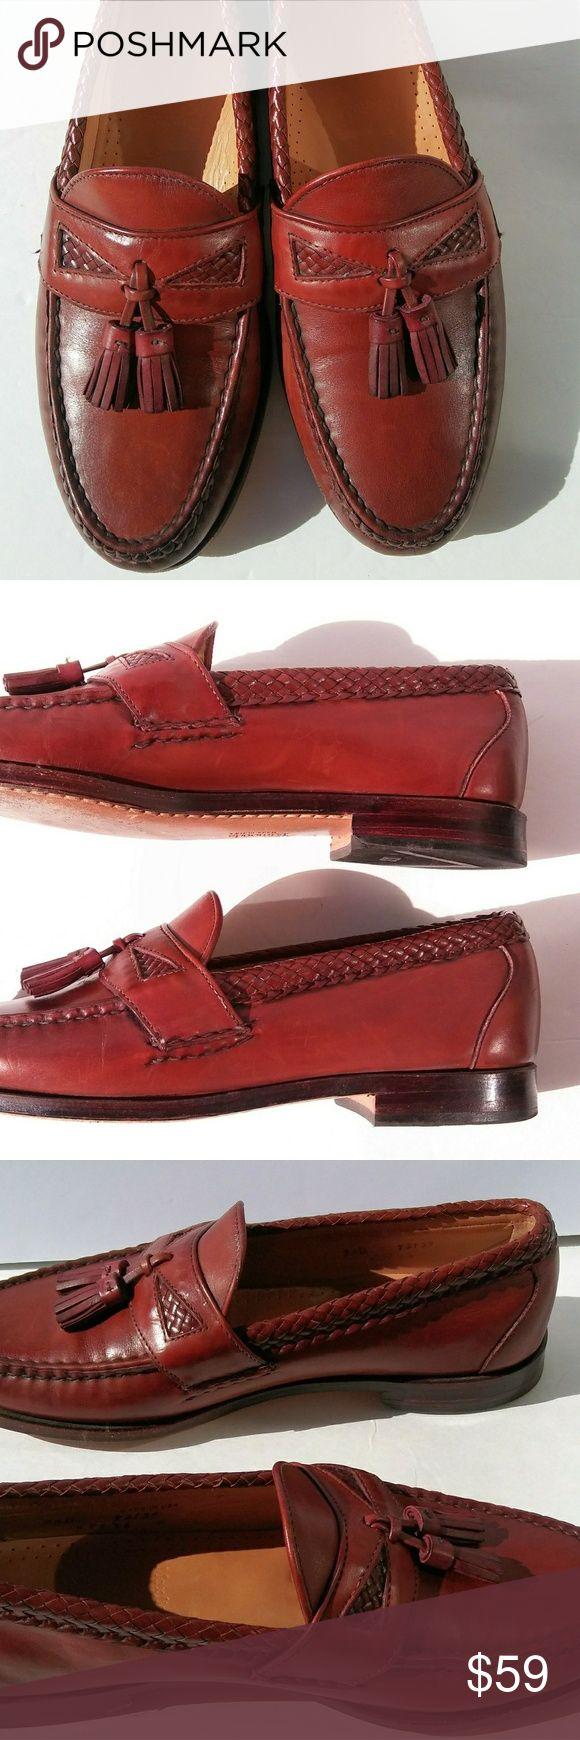 Allen Edmonds Maxfield Mens Tassel Loafers 9.5D ALLEN EDMONDS MAXFIELD TASSEL LOAFER  MENS SHOES BROWN 9.5D 92139 Excellent condition! Minimal wear! Great quality! Allen Edmonds Shoes Loafers & Slip-Ons